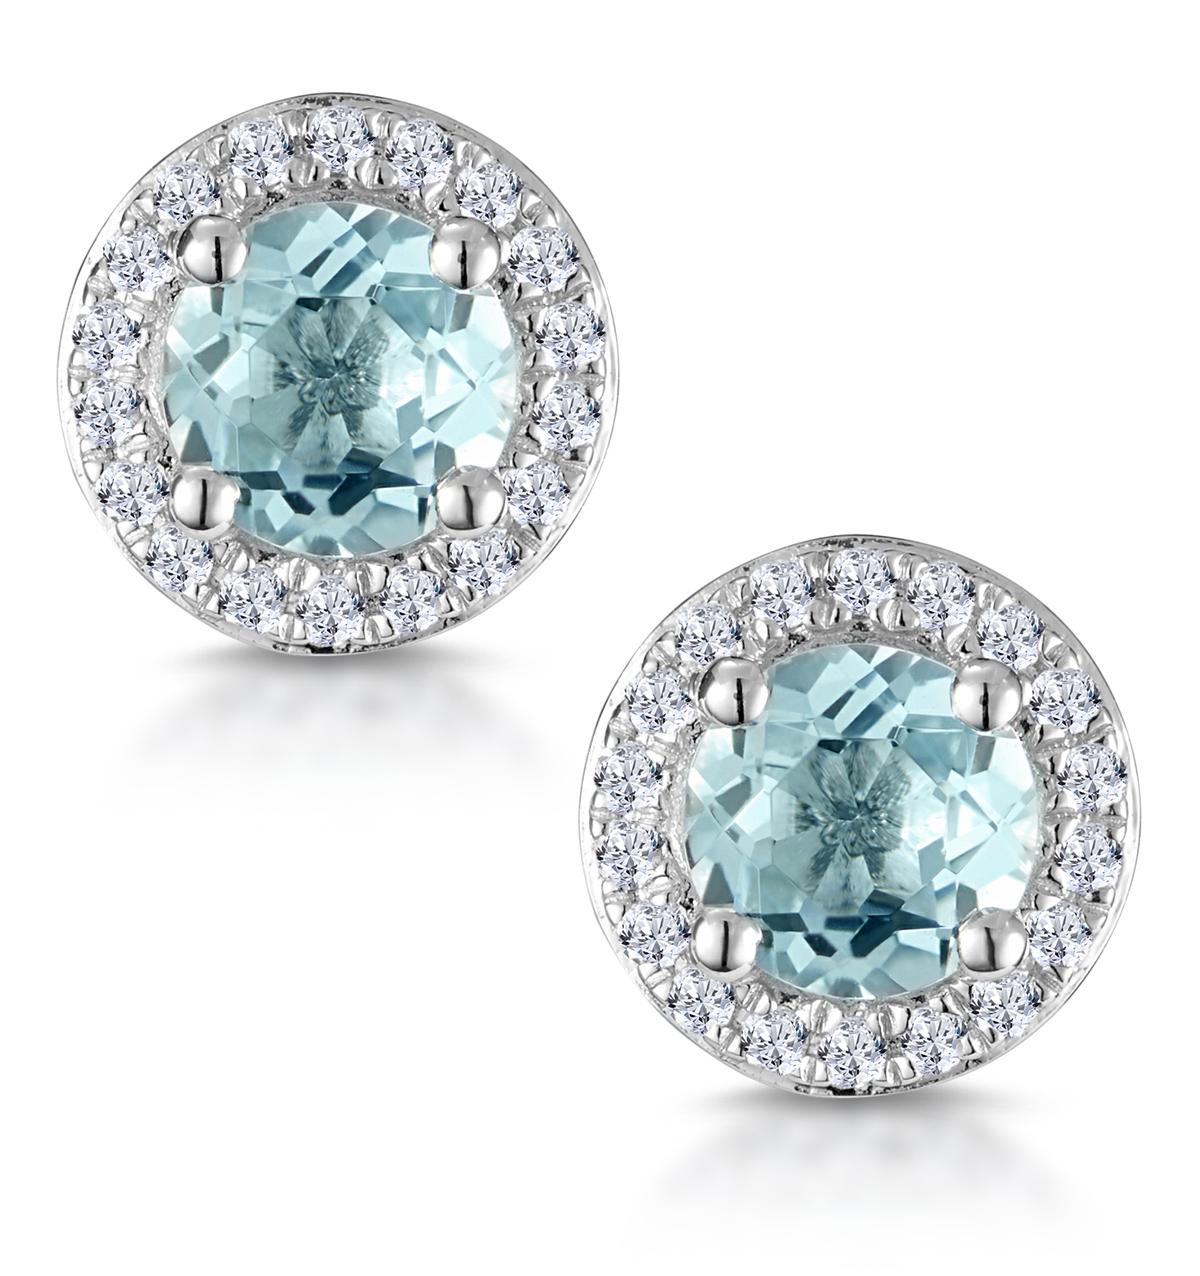 0.69CT AQUA MARINE AND DIAMOND HALO STELLATO EARRINGS IN 9K WHITE GOLD